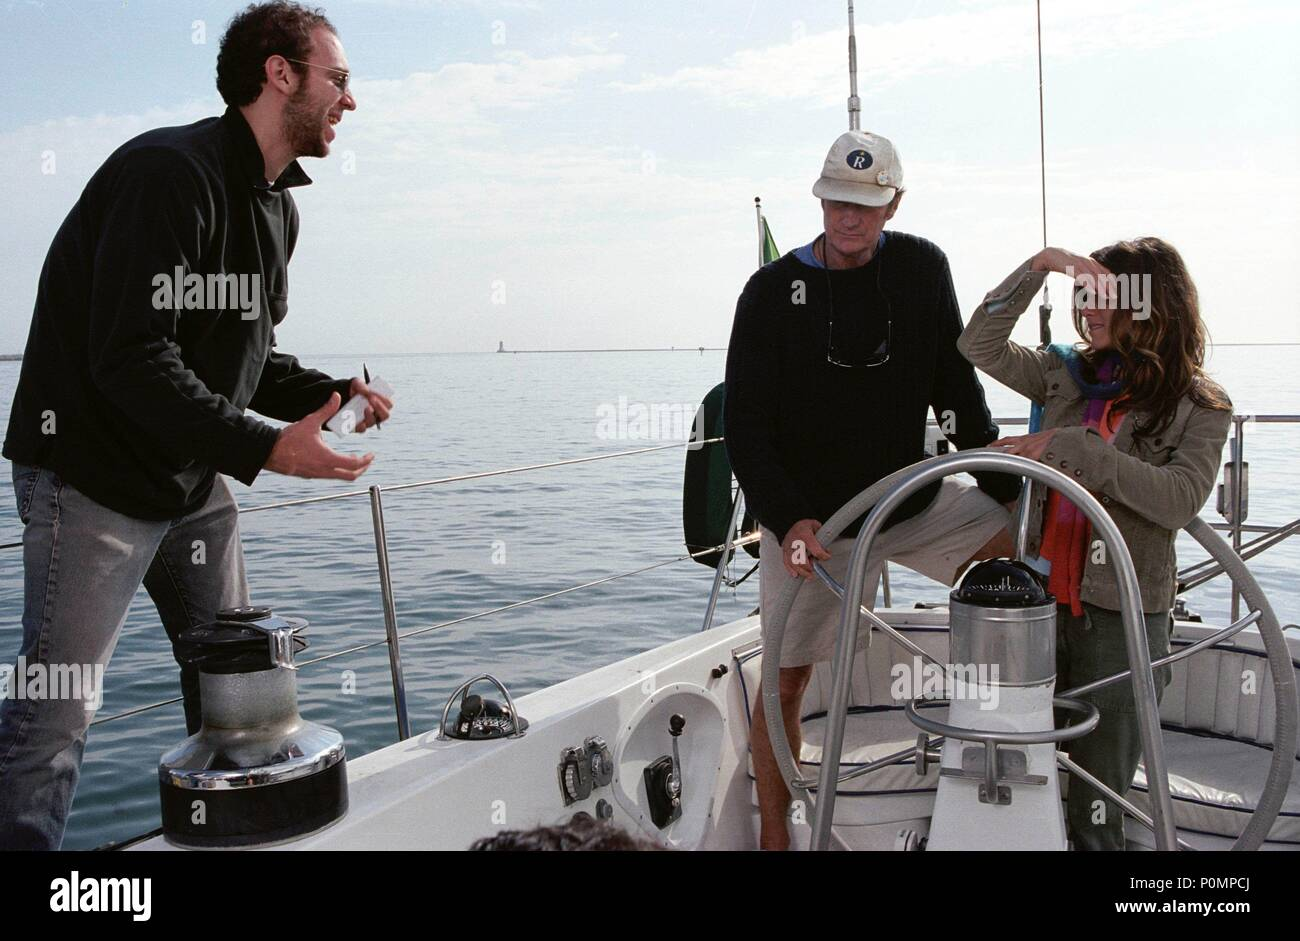 along came polly scuba boat scene